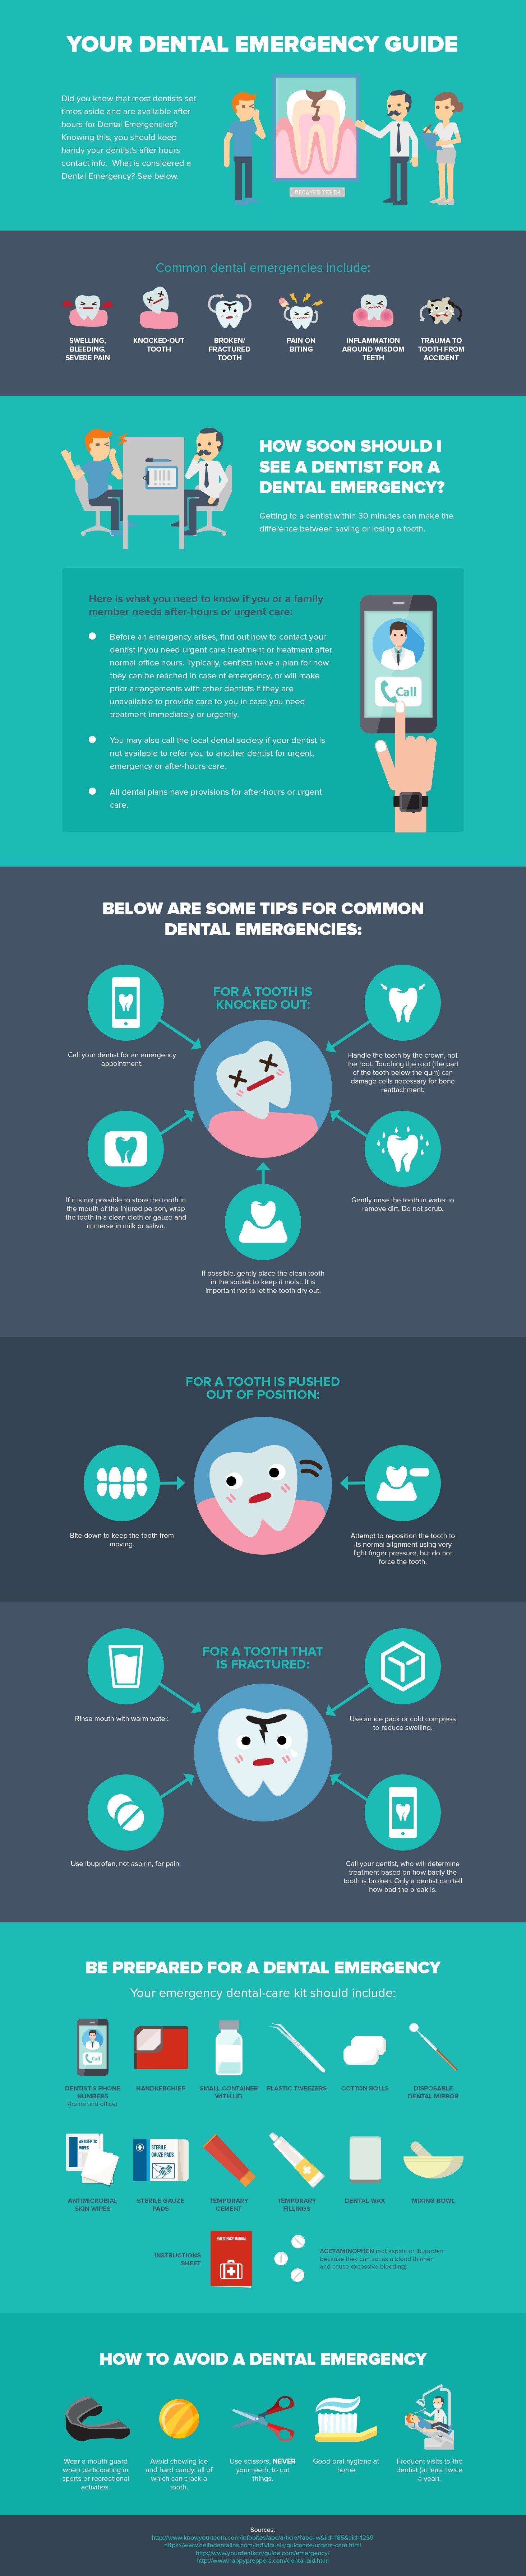 Dental Emergency infographic high resolution.jpg